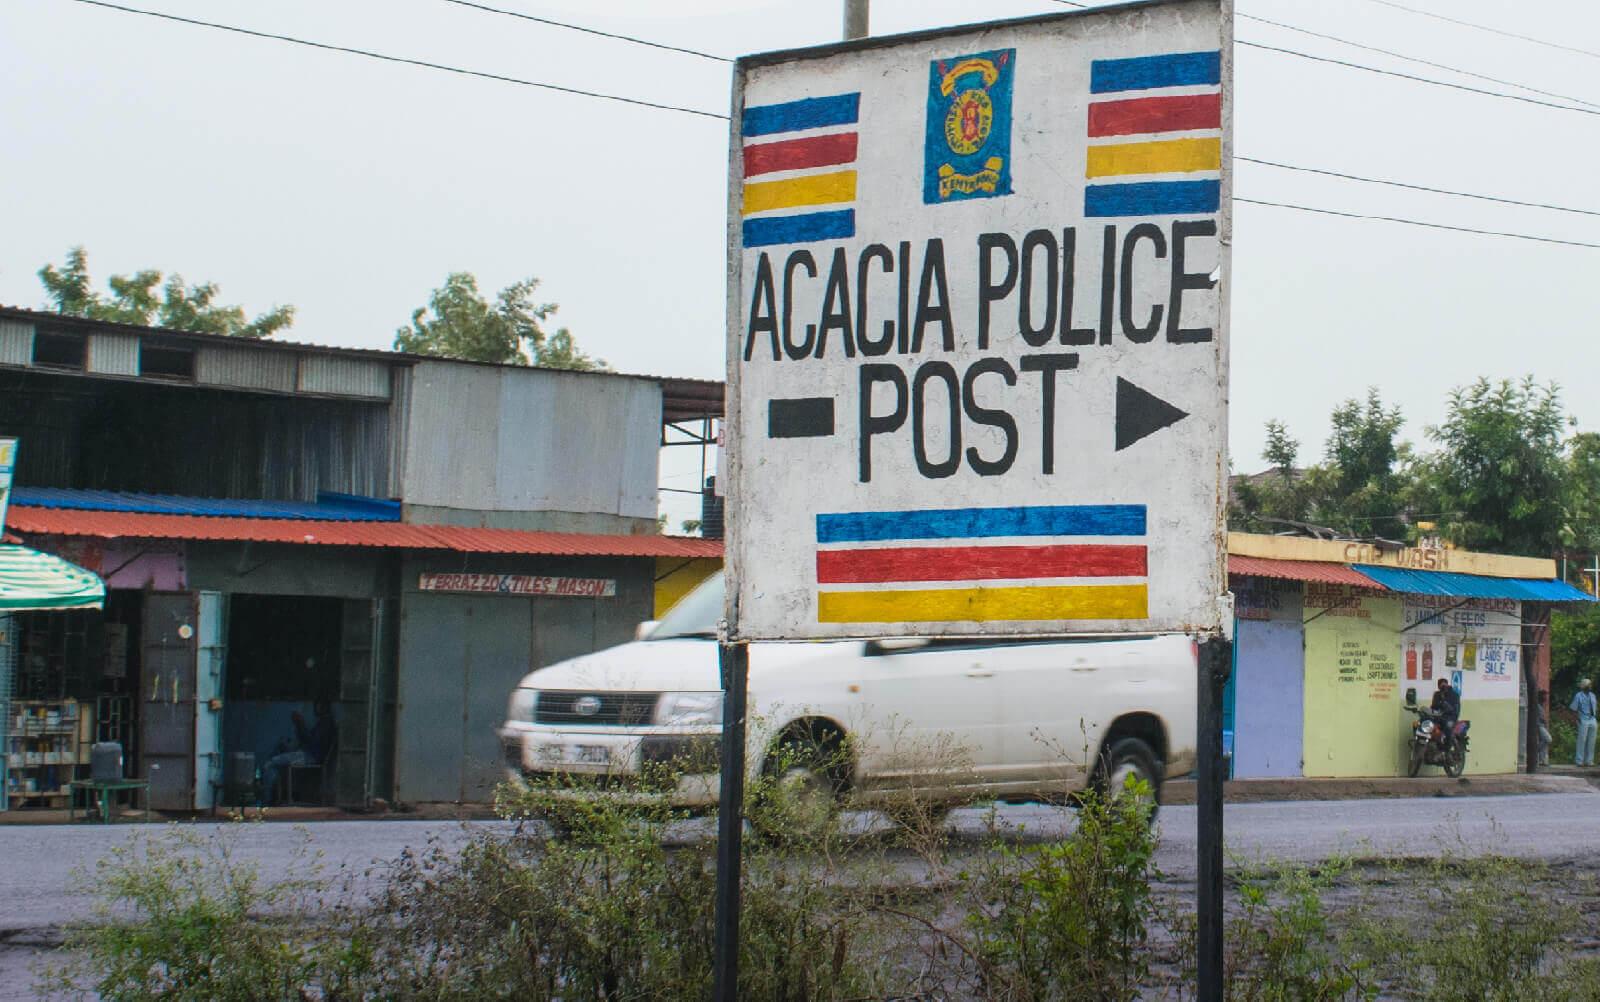 police post along kangundo road